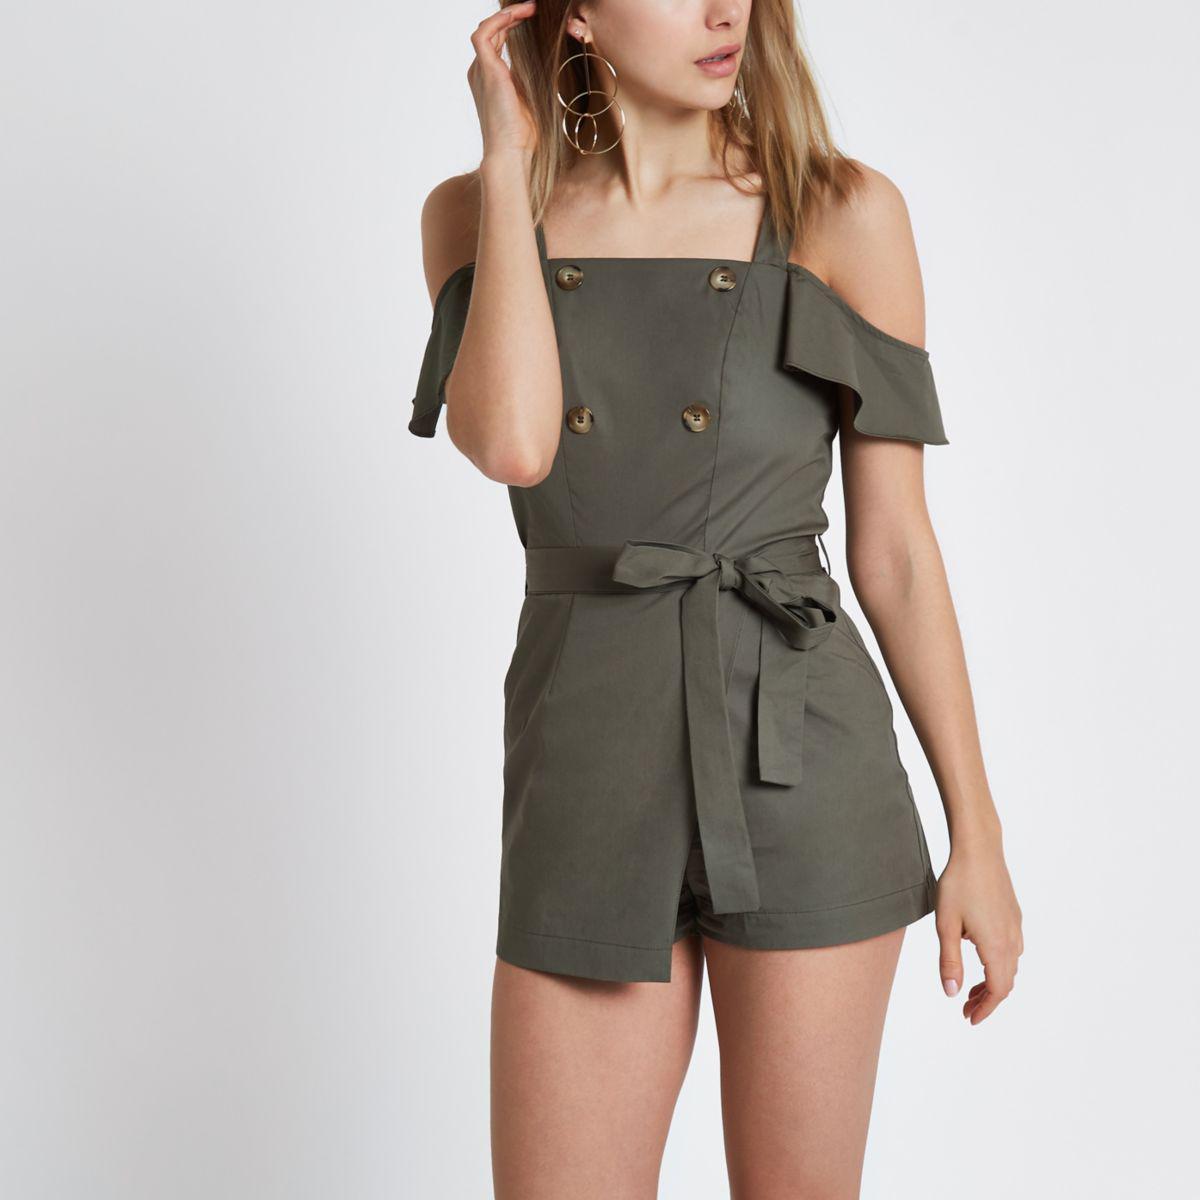 For Sale Footlocker Womens Khaki bardot frill sleeve playsuit River Island Clean And Classic Cheap Shop 1KS4O